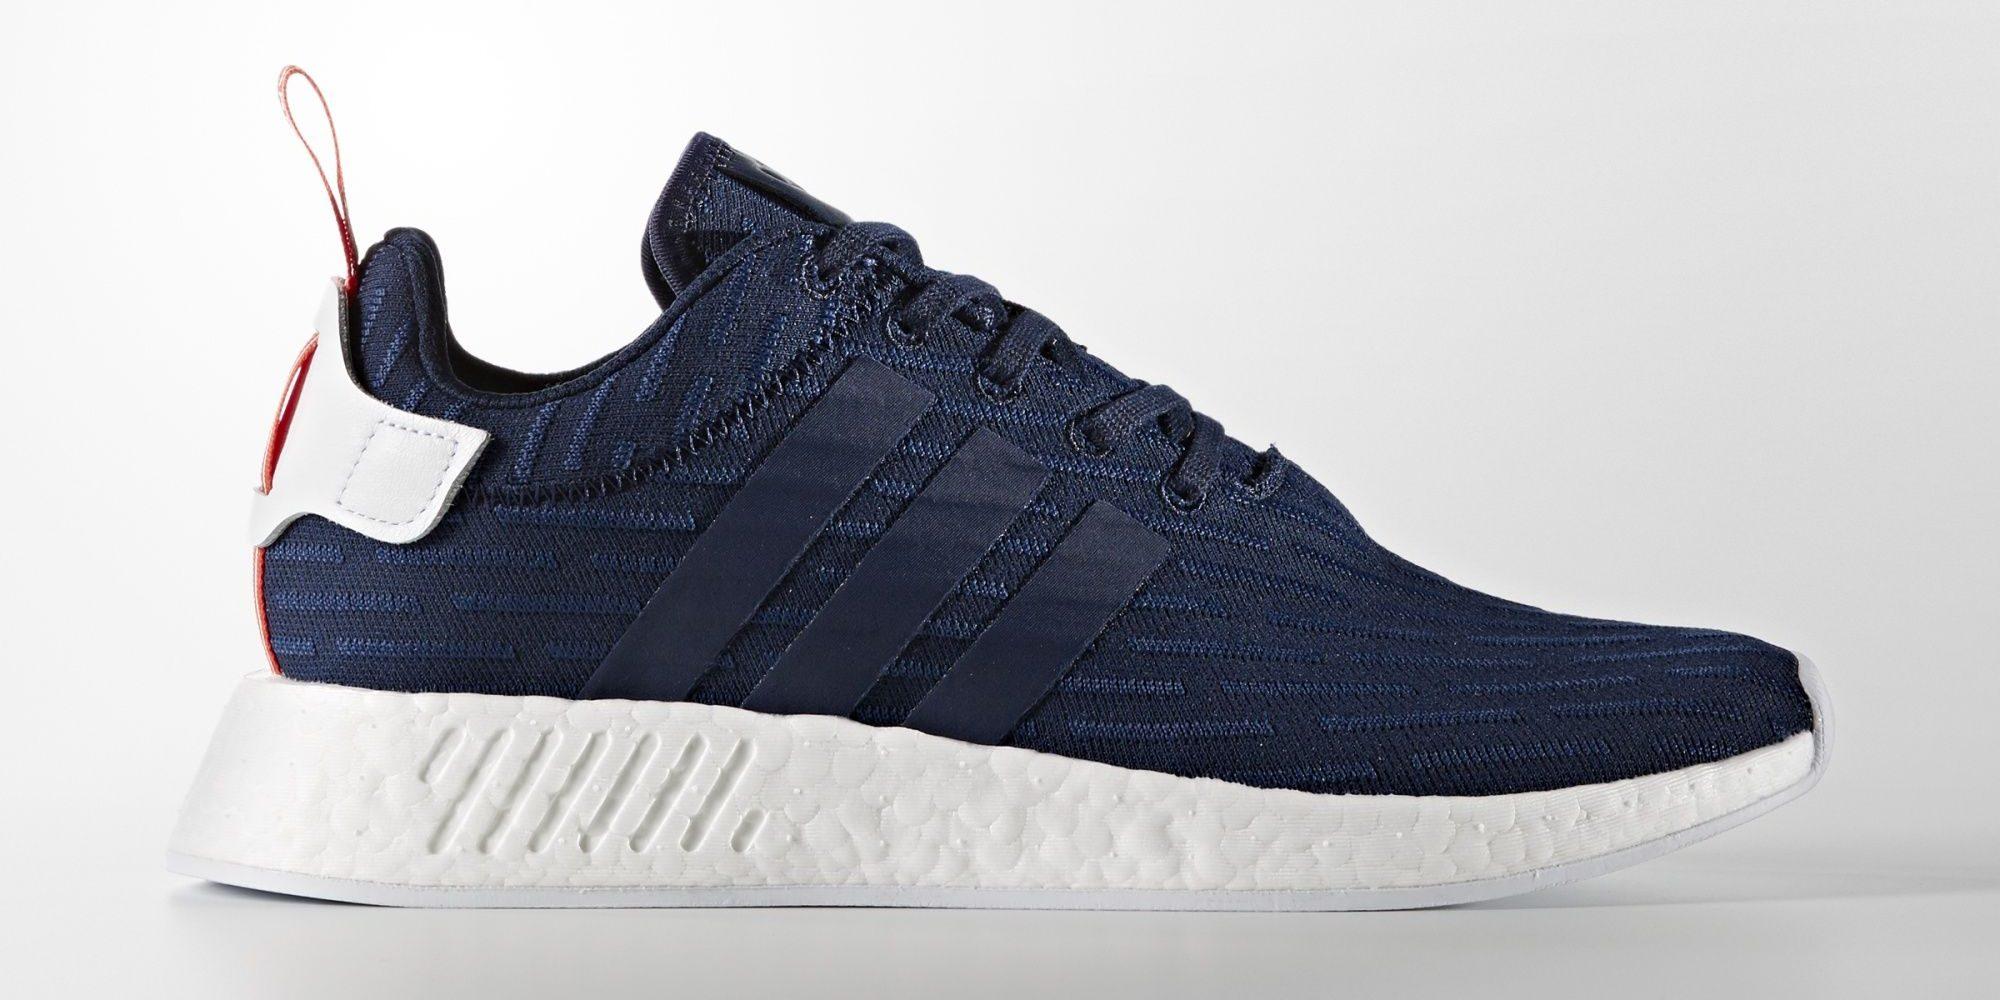 Black Adidas Nmd R2 Primeknit Sneakers For Men Farfetc.